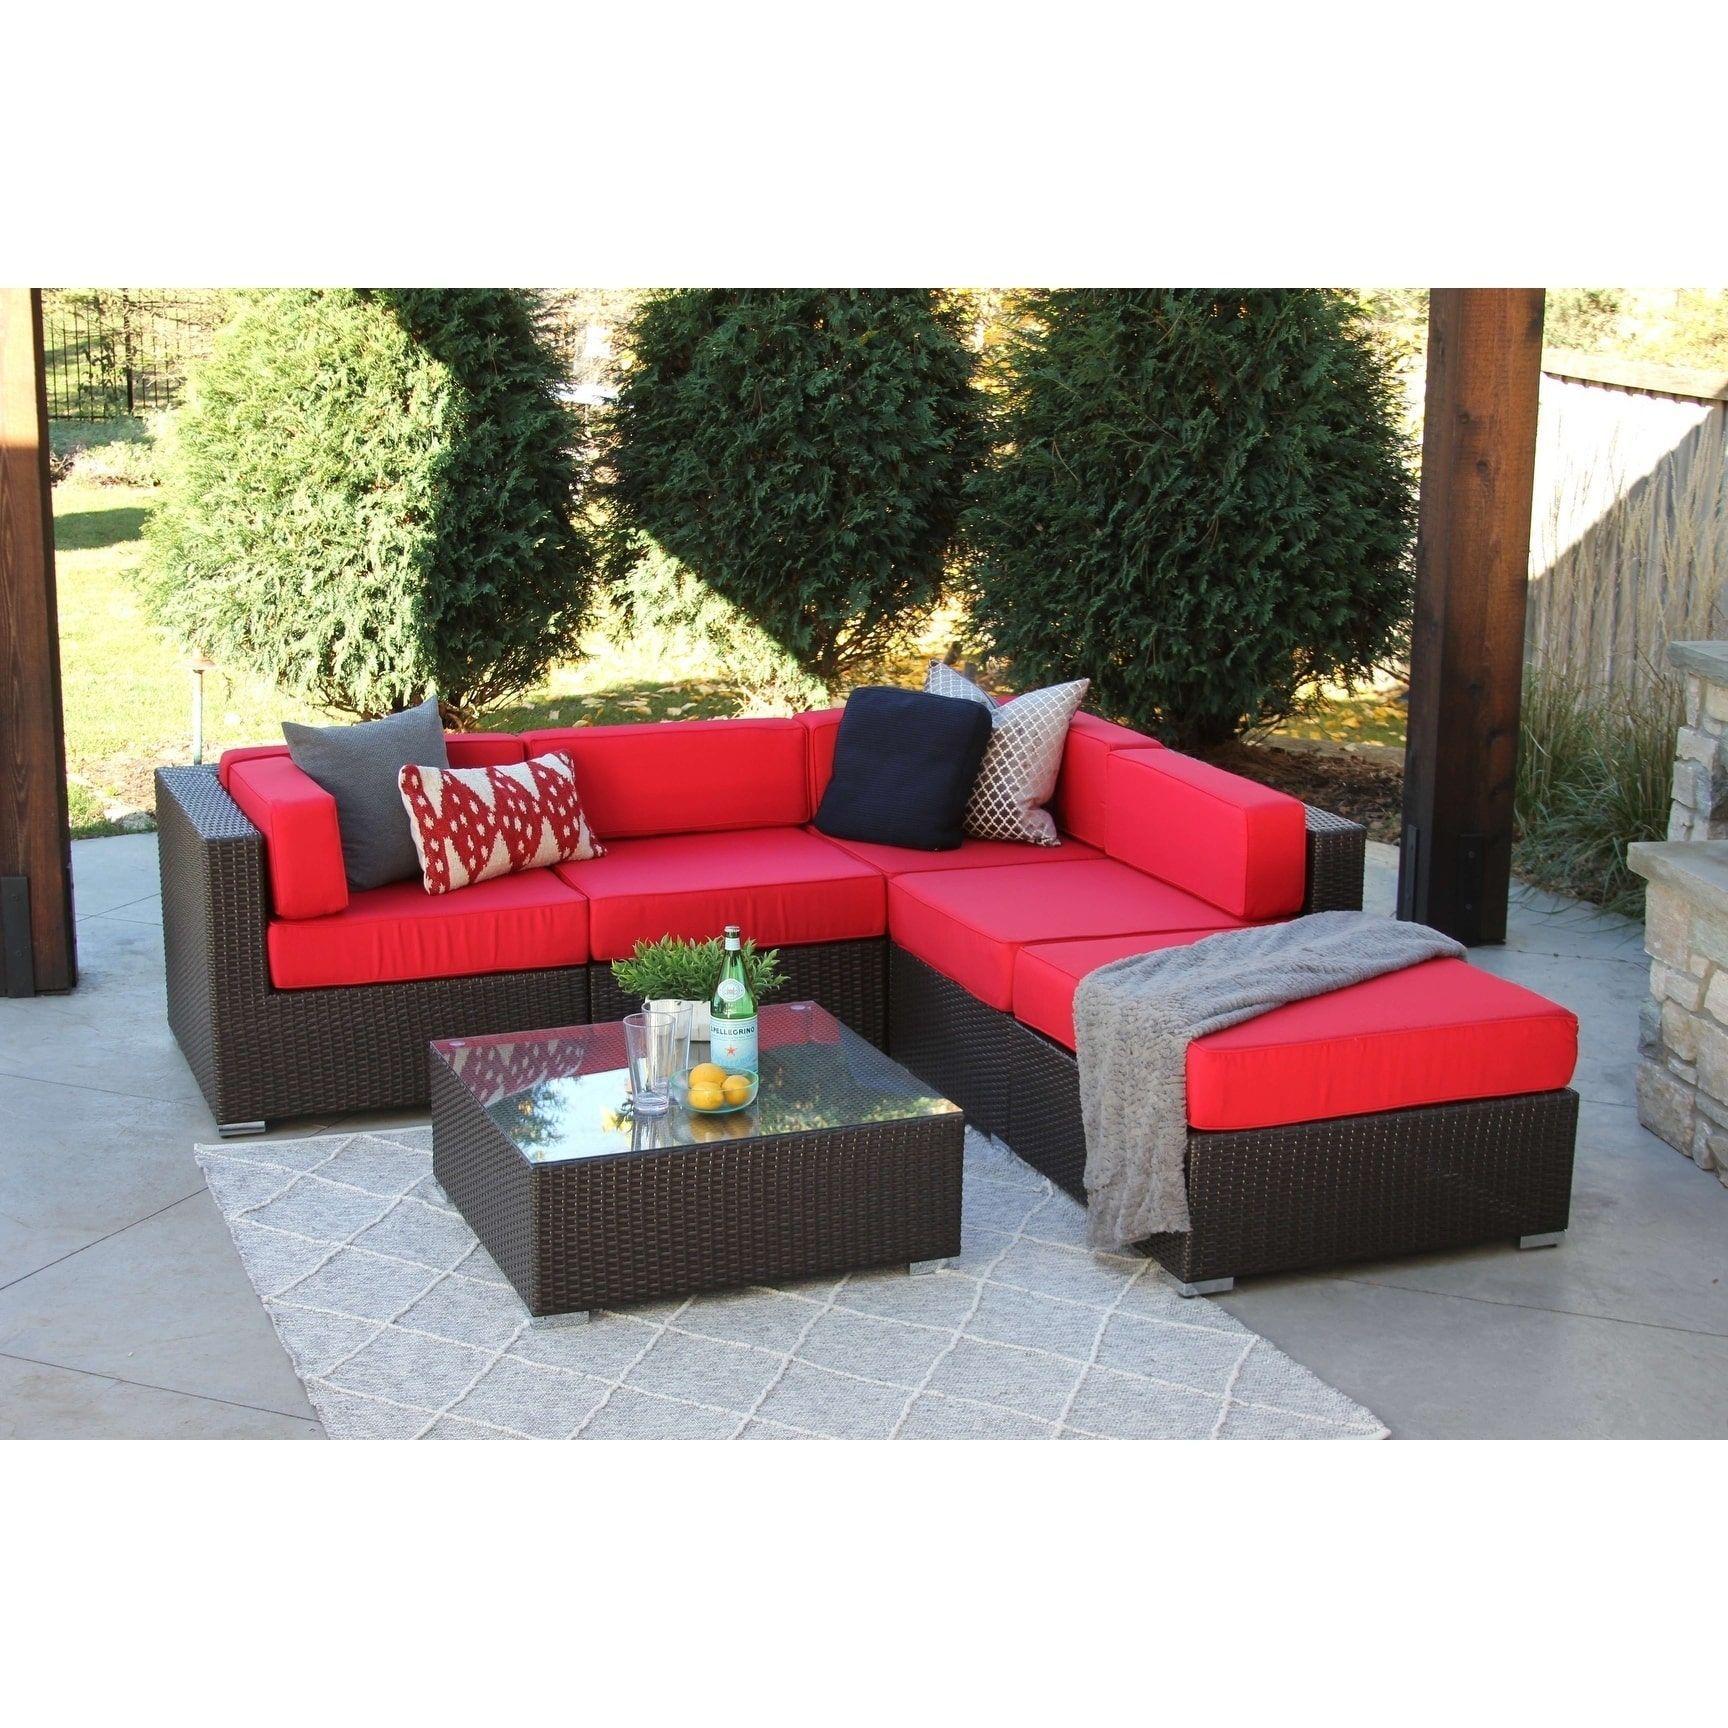 Nicolett Rattan Wicker 6-piece Modern Outdoor Patio Furniture Sofa ...